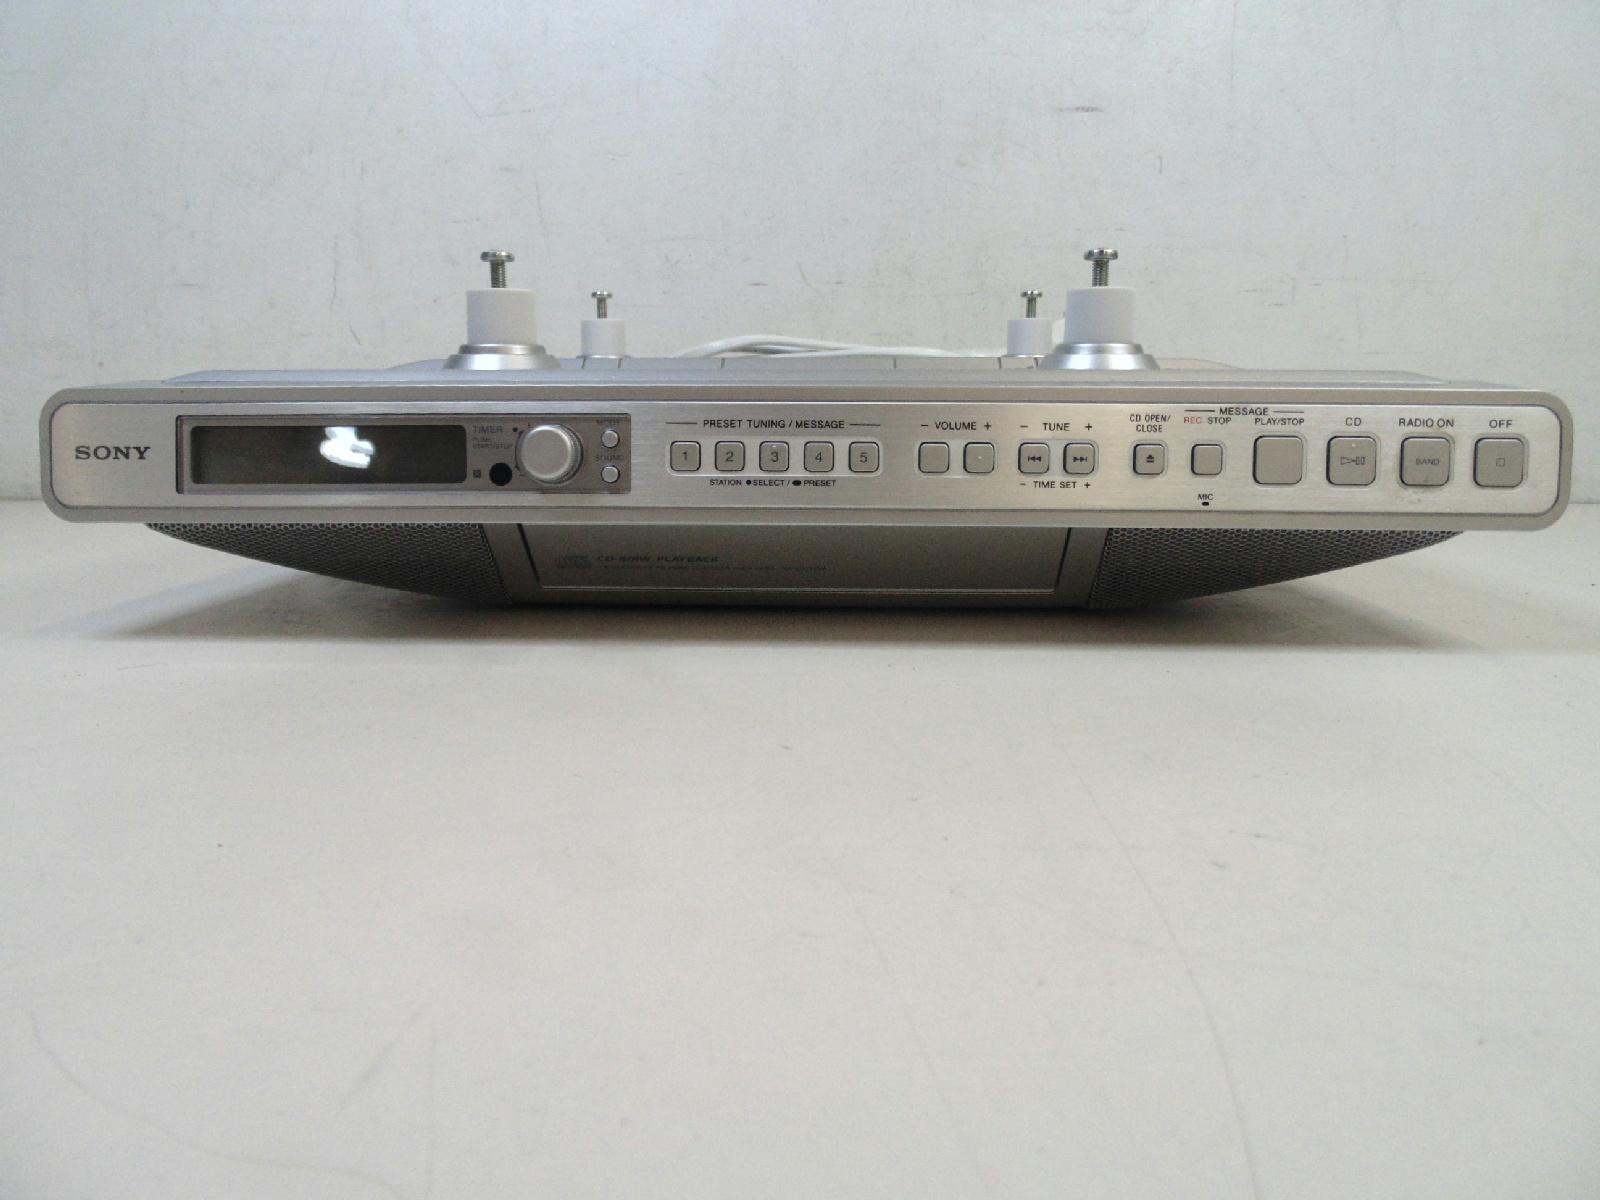 sony kitchen clock radio under cabinet am fm radio cd. Black Bedroom Furniture Sets. Home Design Ideas